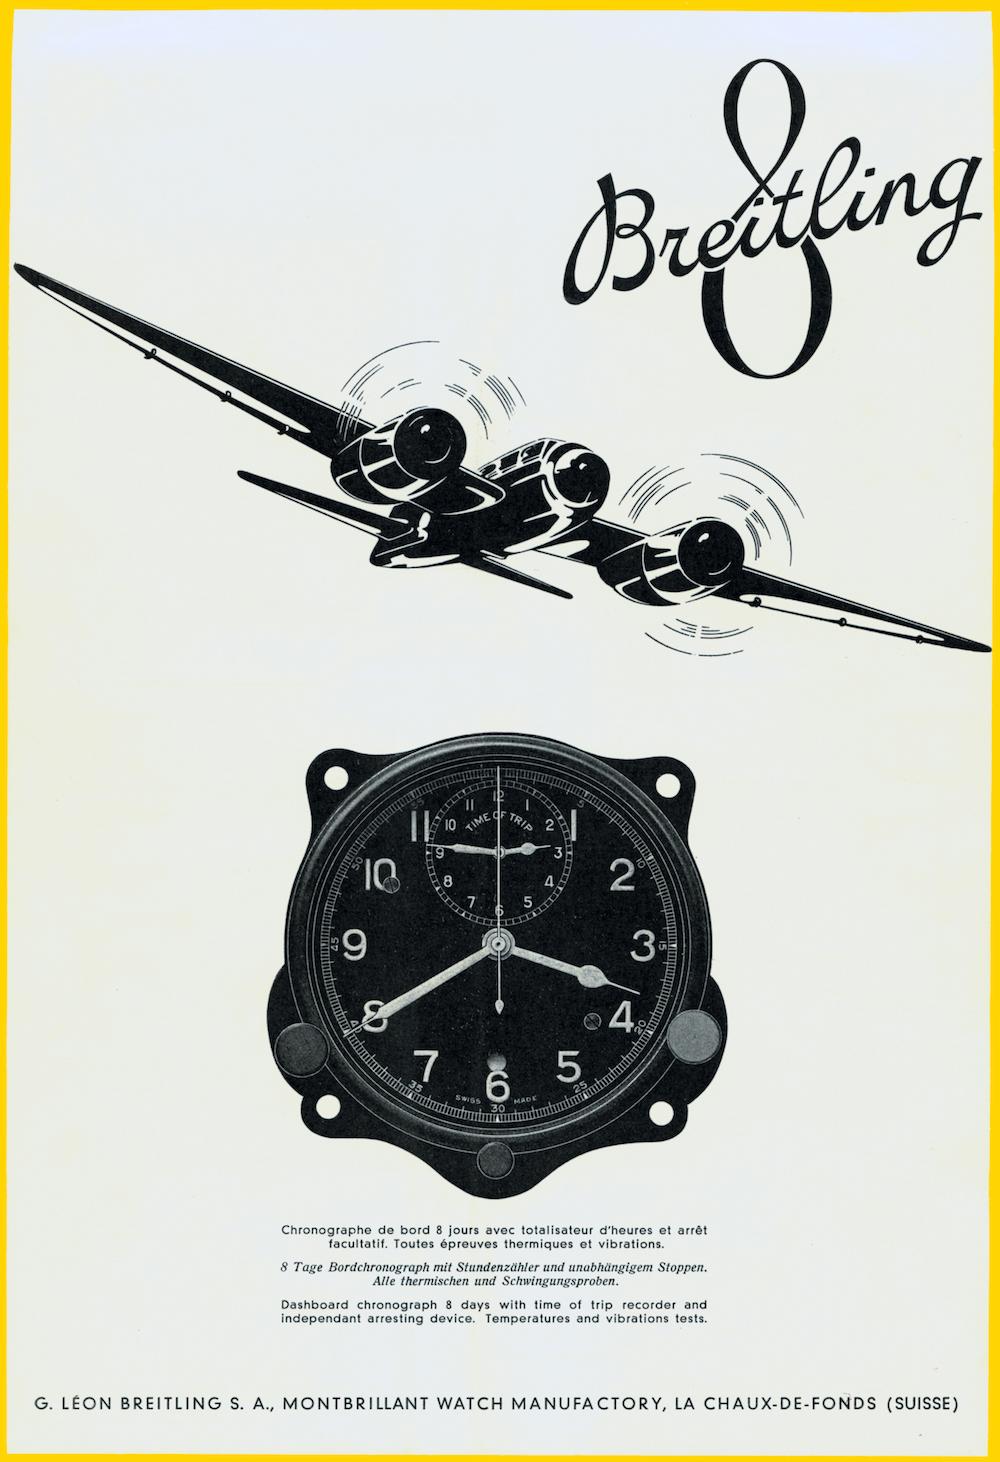 breitling-1940s-hirdetes-reklam-huit-aviation-department-svajciora-karora-luxusora-regi-ora-vintage-breitling-pilota-ora.jpg